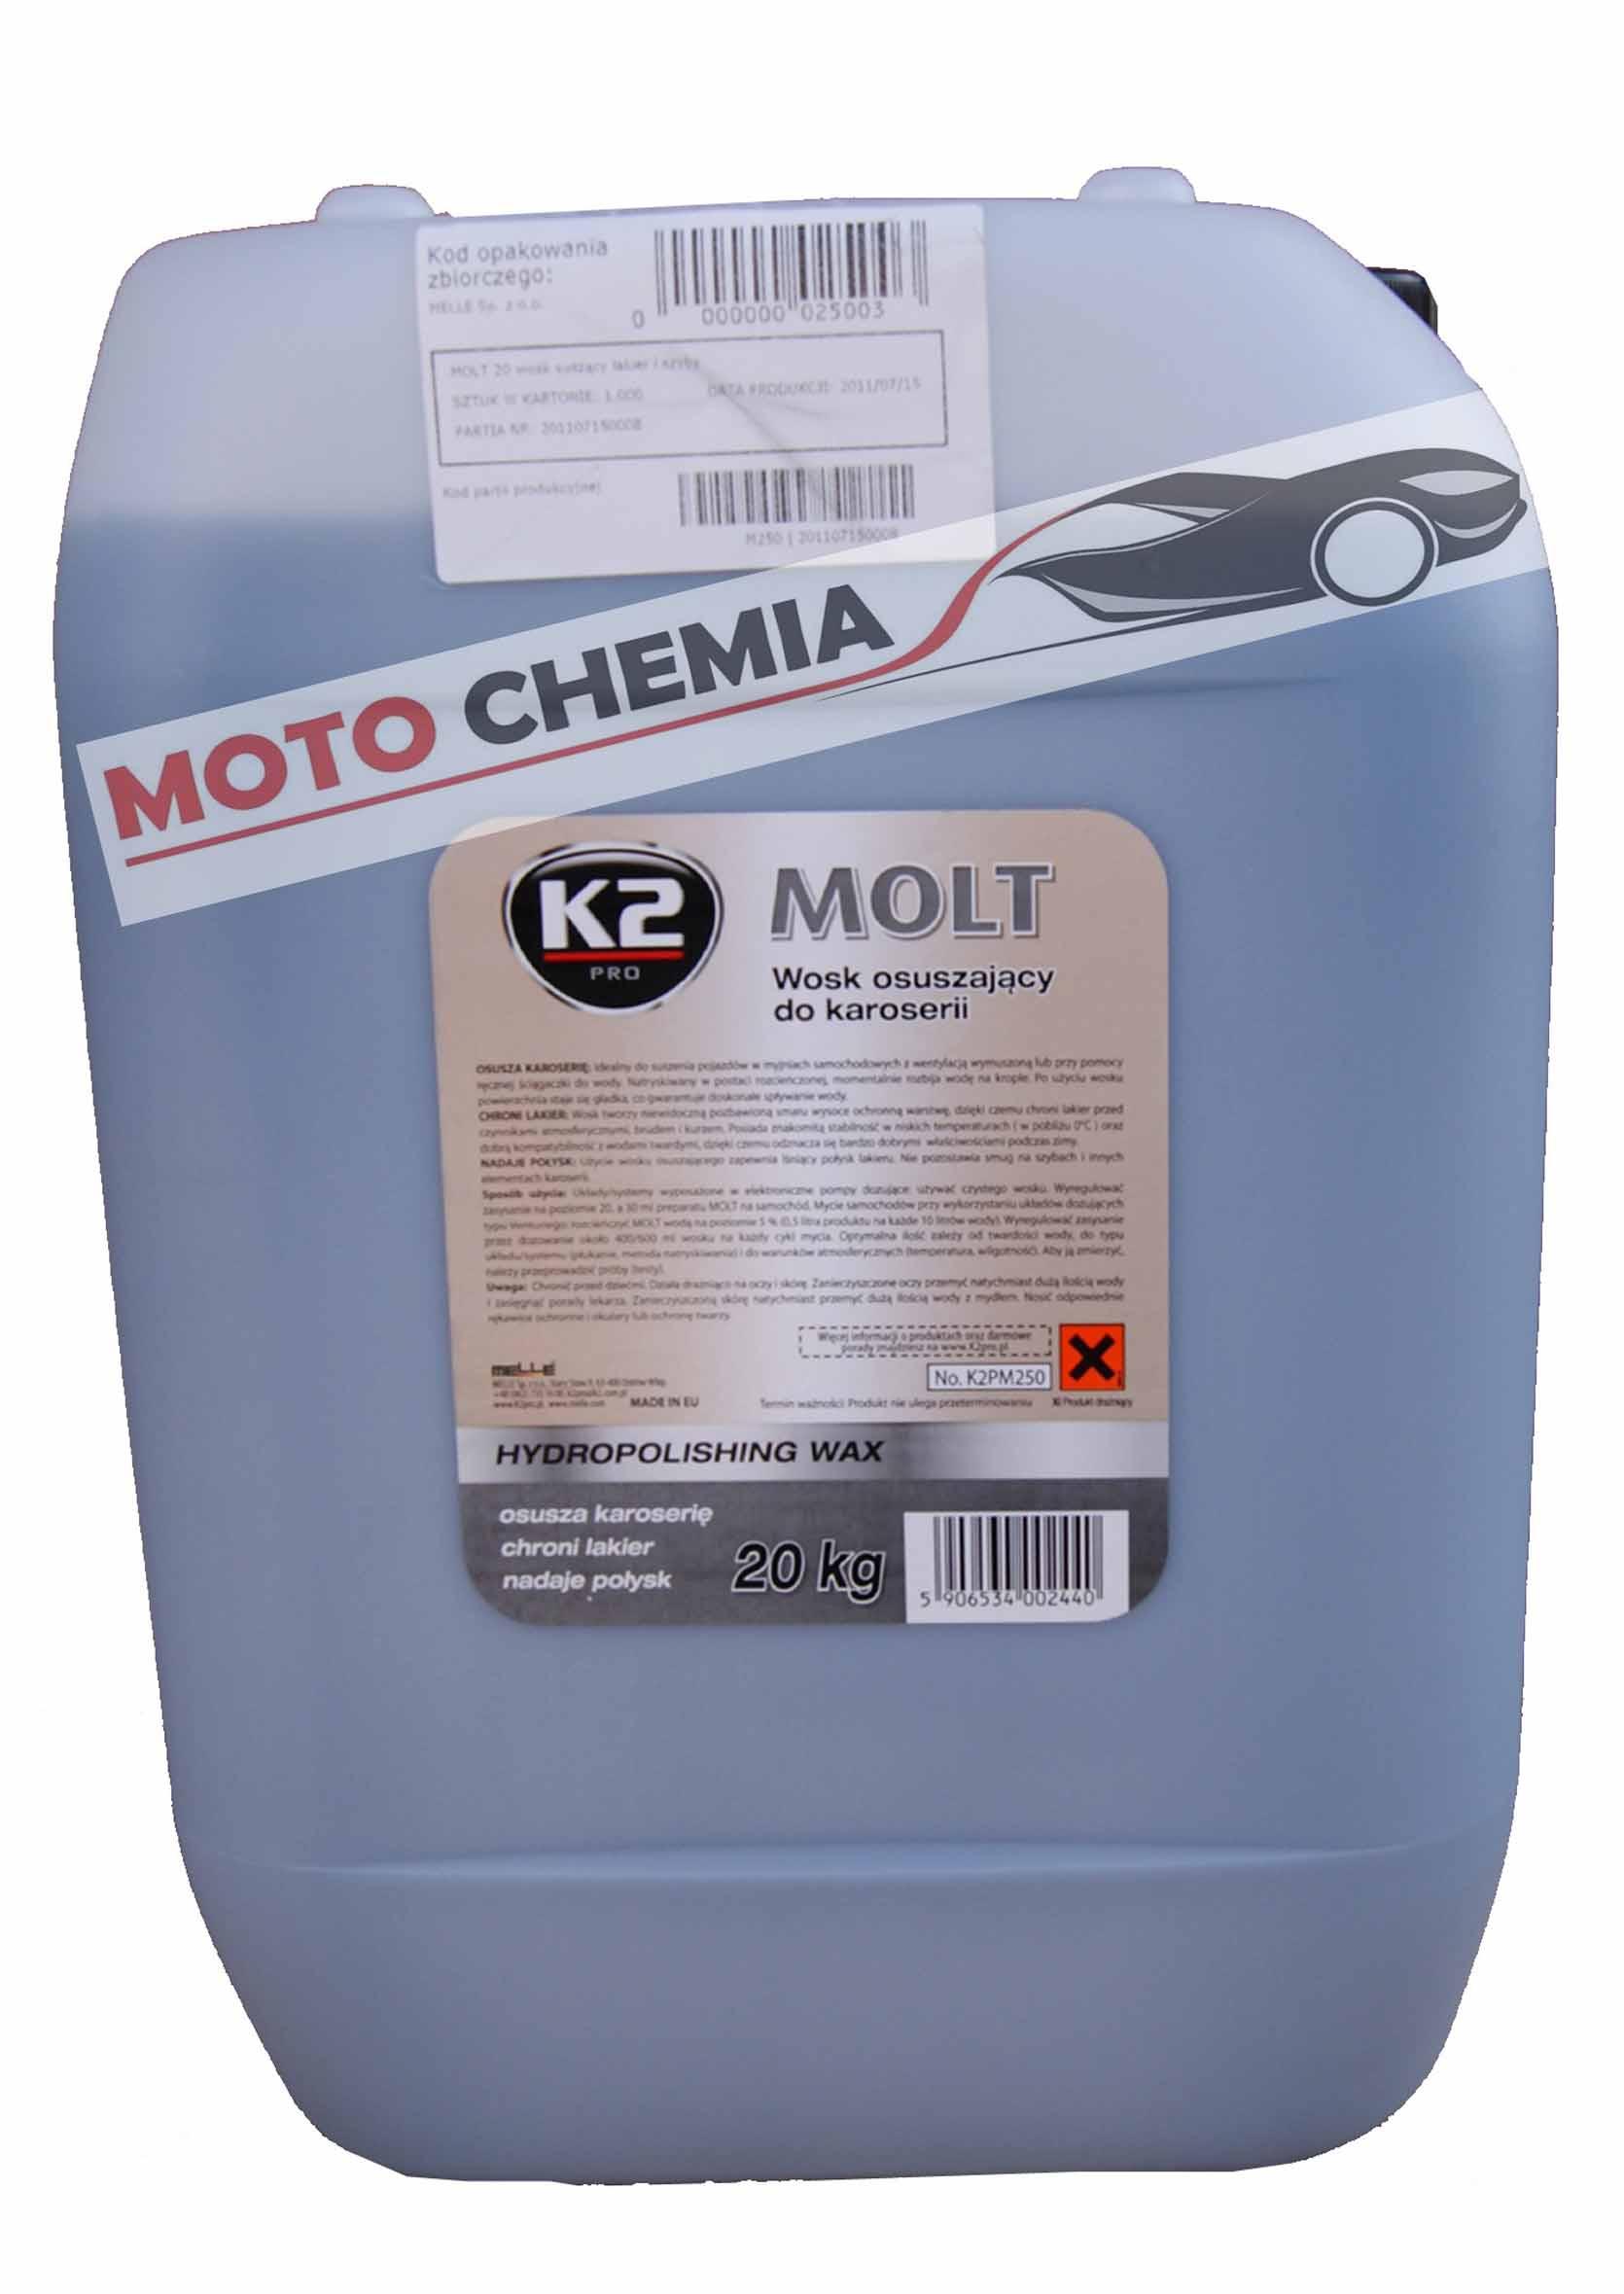 Hydrowosk suszący do lakieru K2 Pro Molt 20kg bez smug